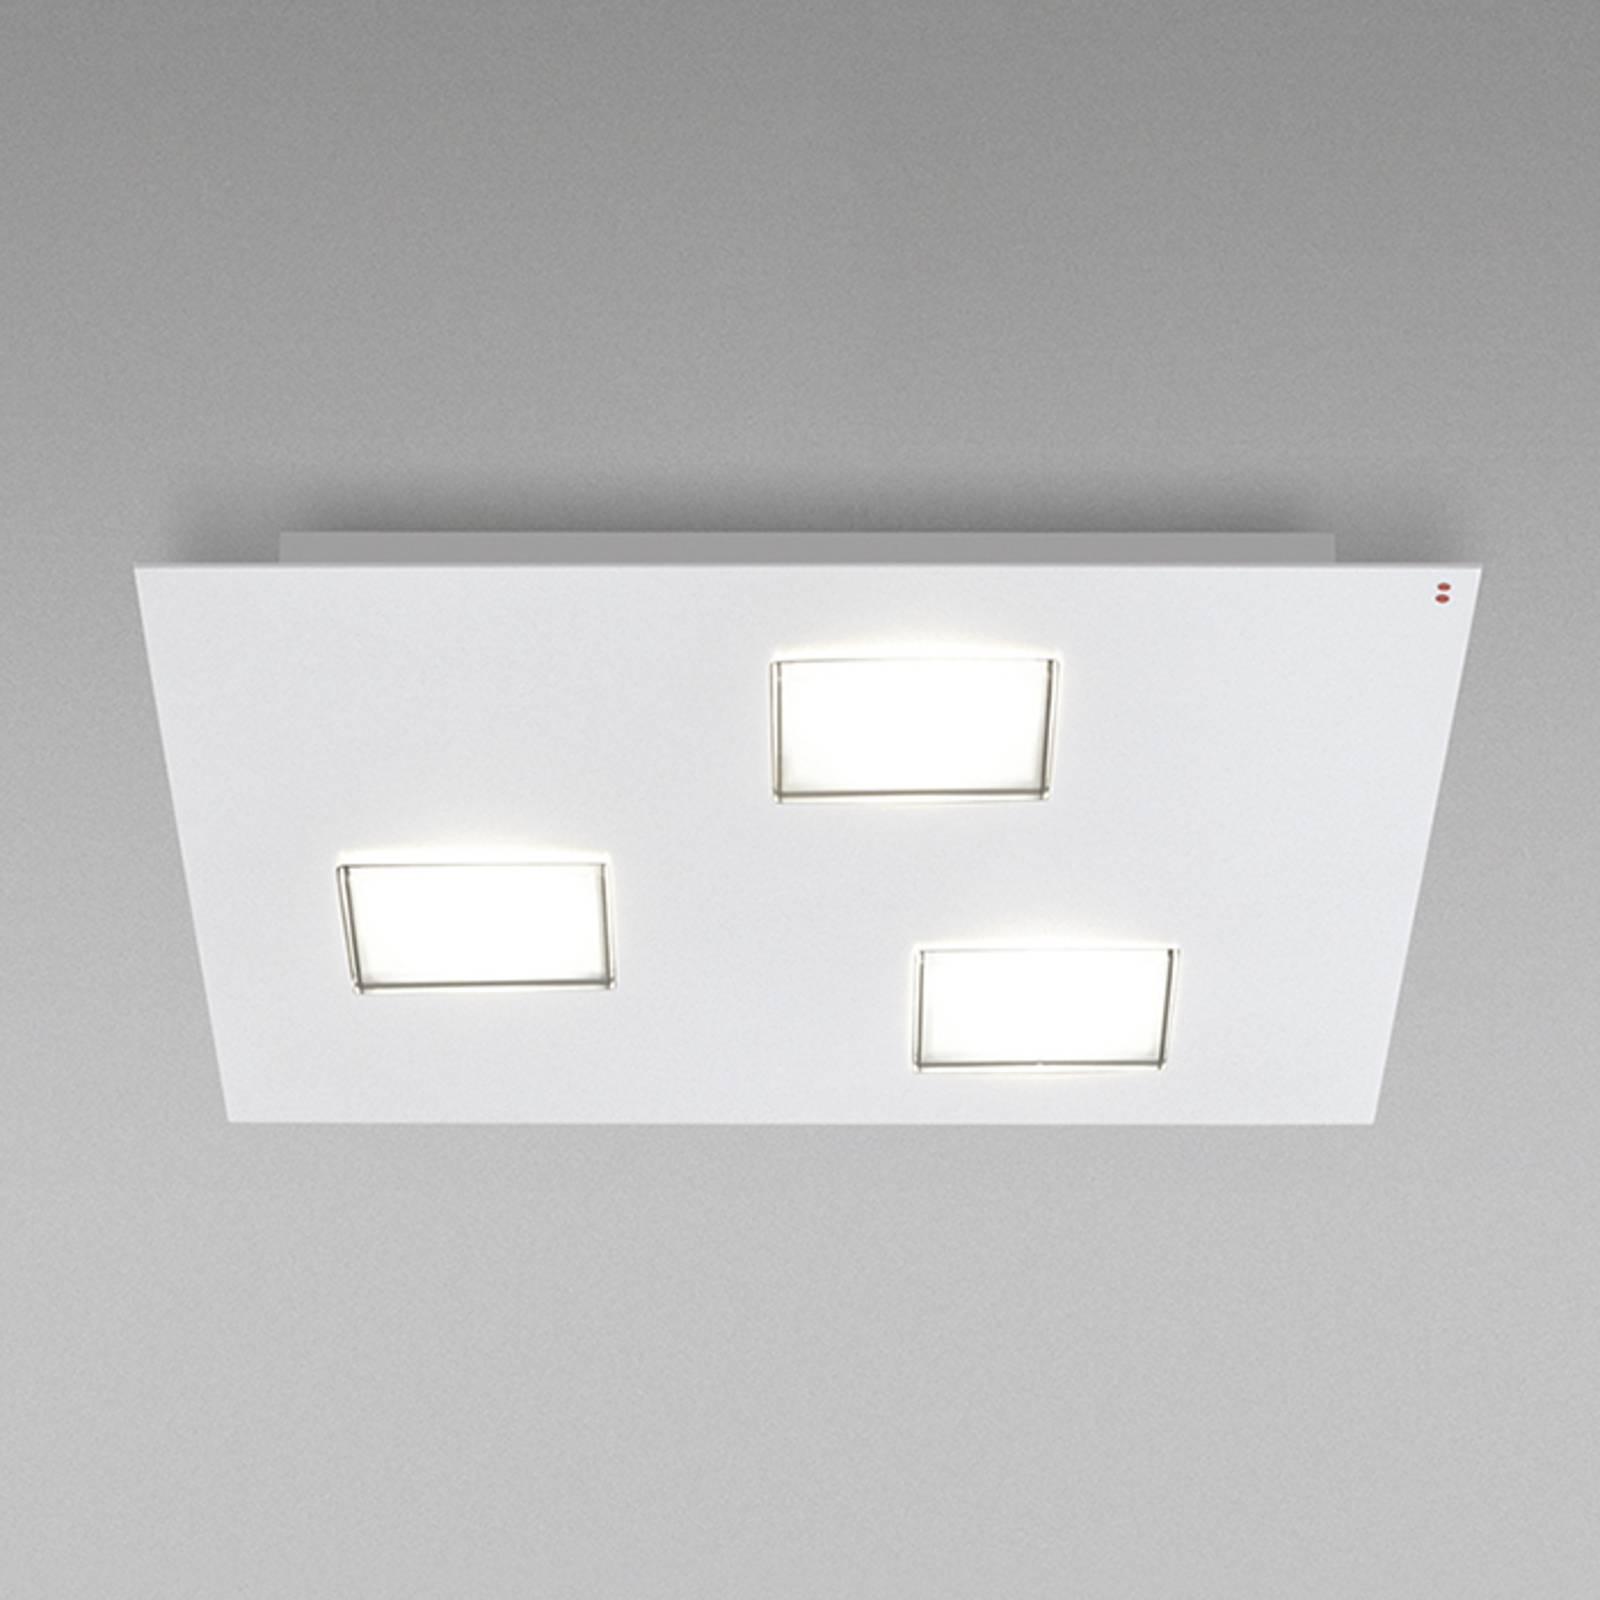 Quarter - LED plafondlamp in wit met 3 LED's